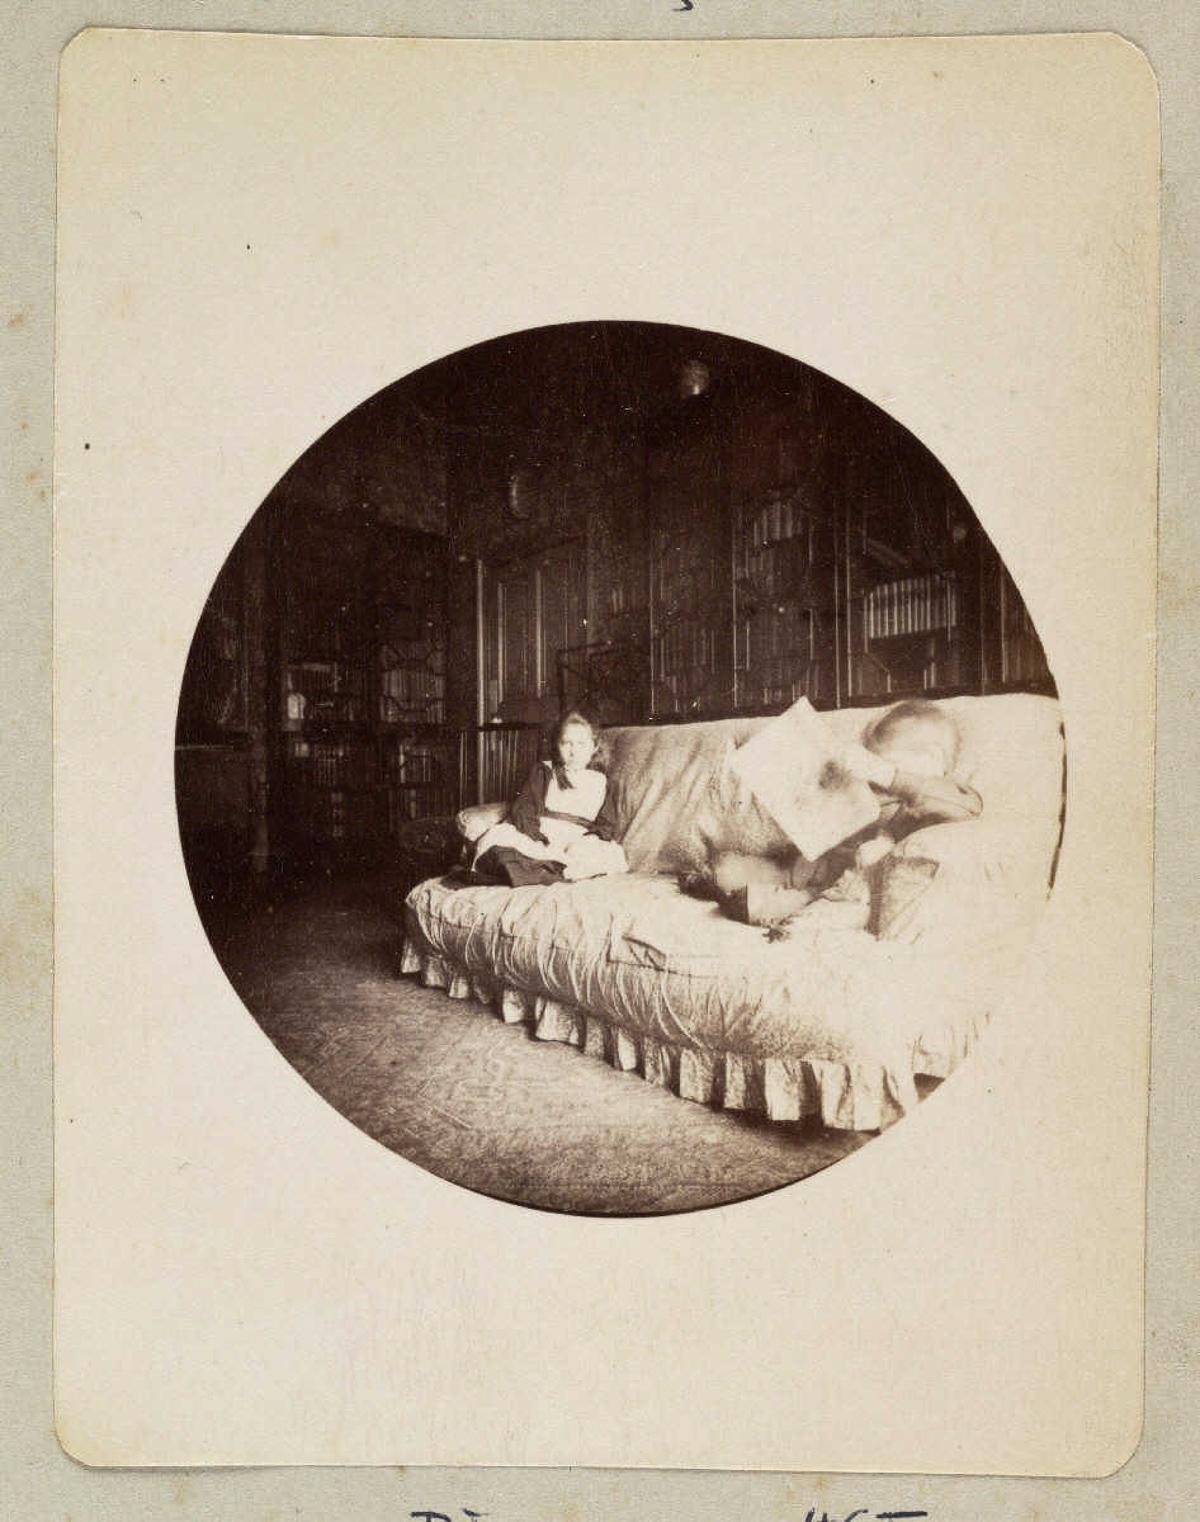 pervye snimki s fotokamery Kodak 15